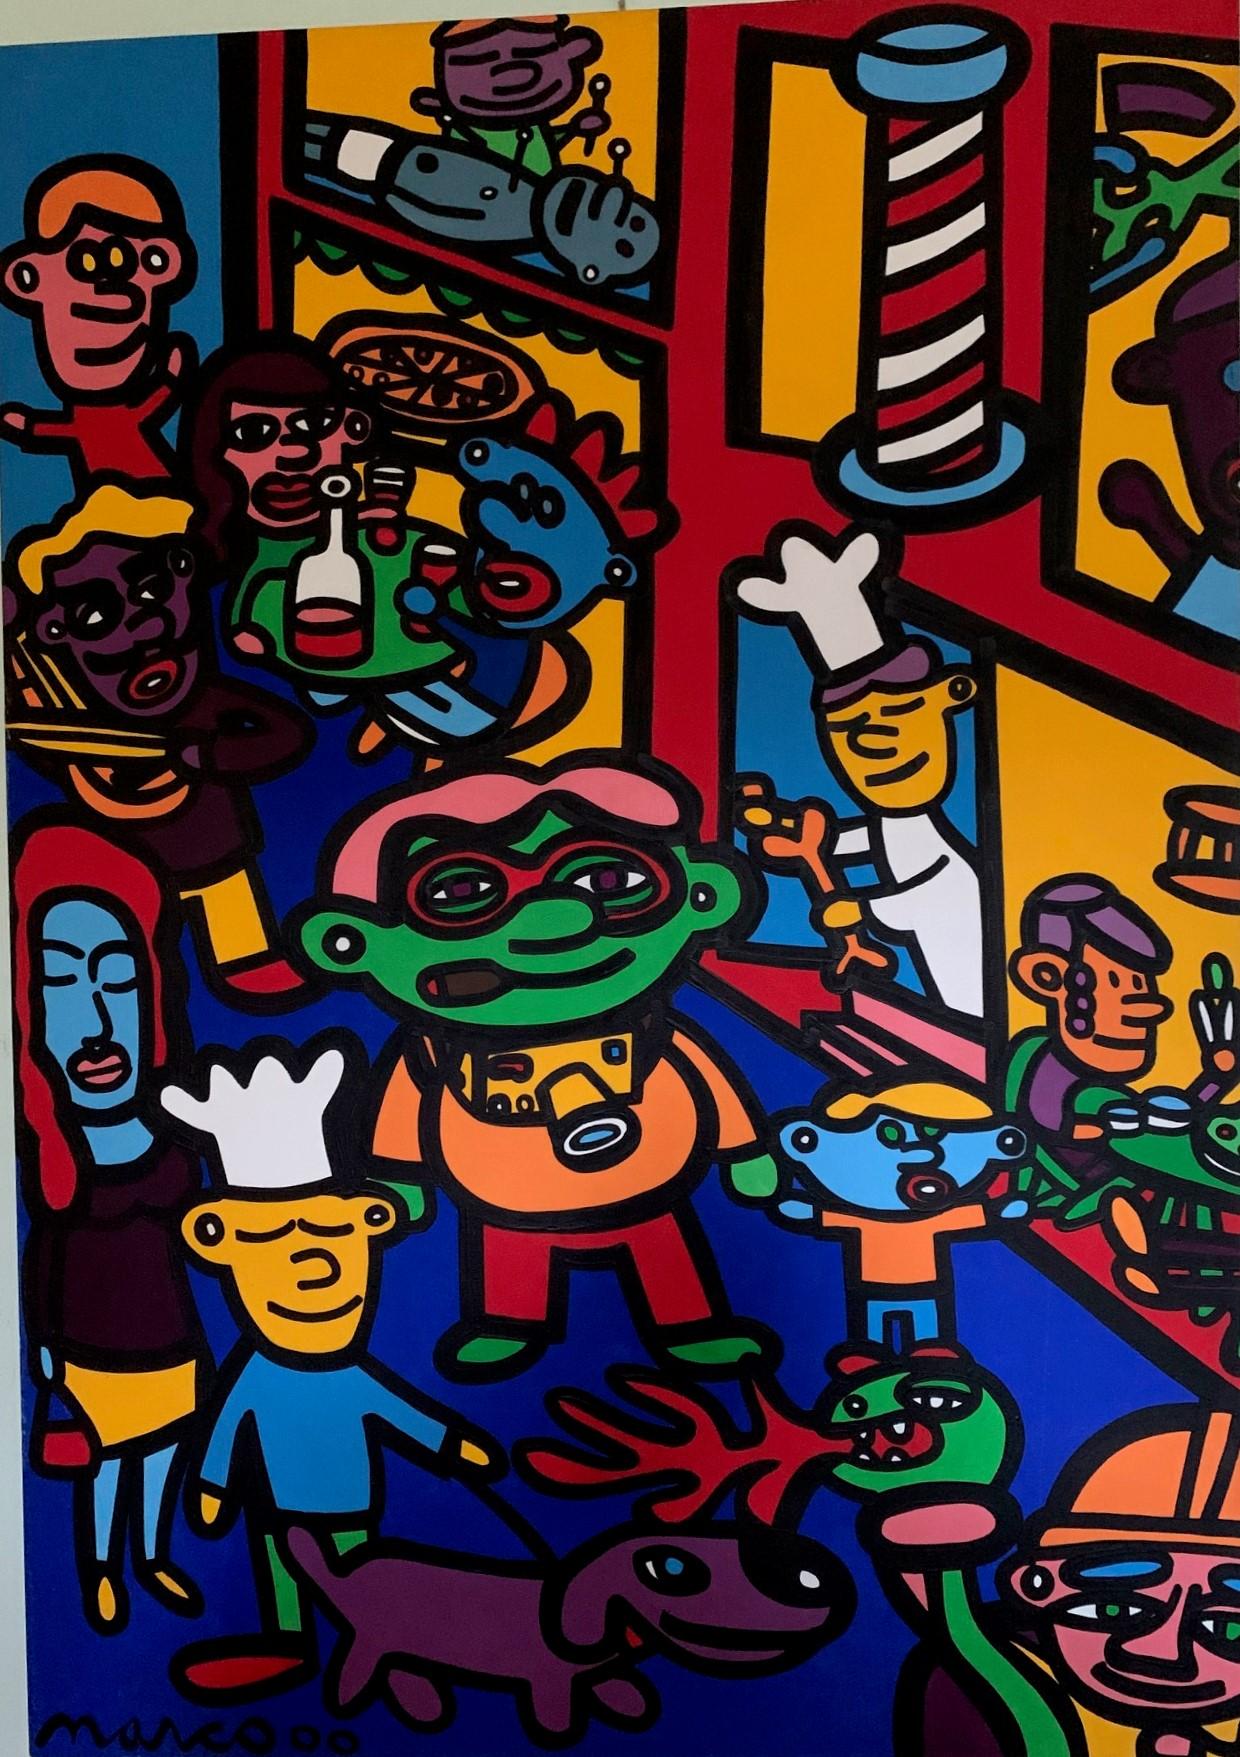 Untitled (Pop Art) by   Marco - Masterpiece Online